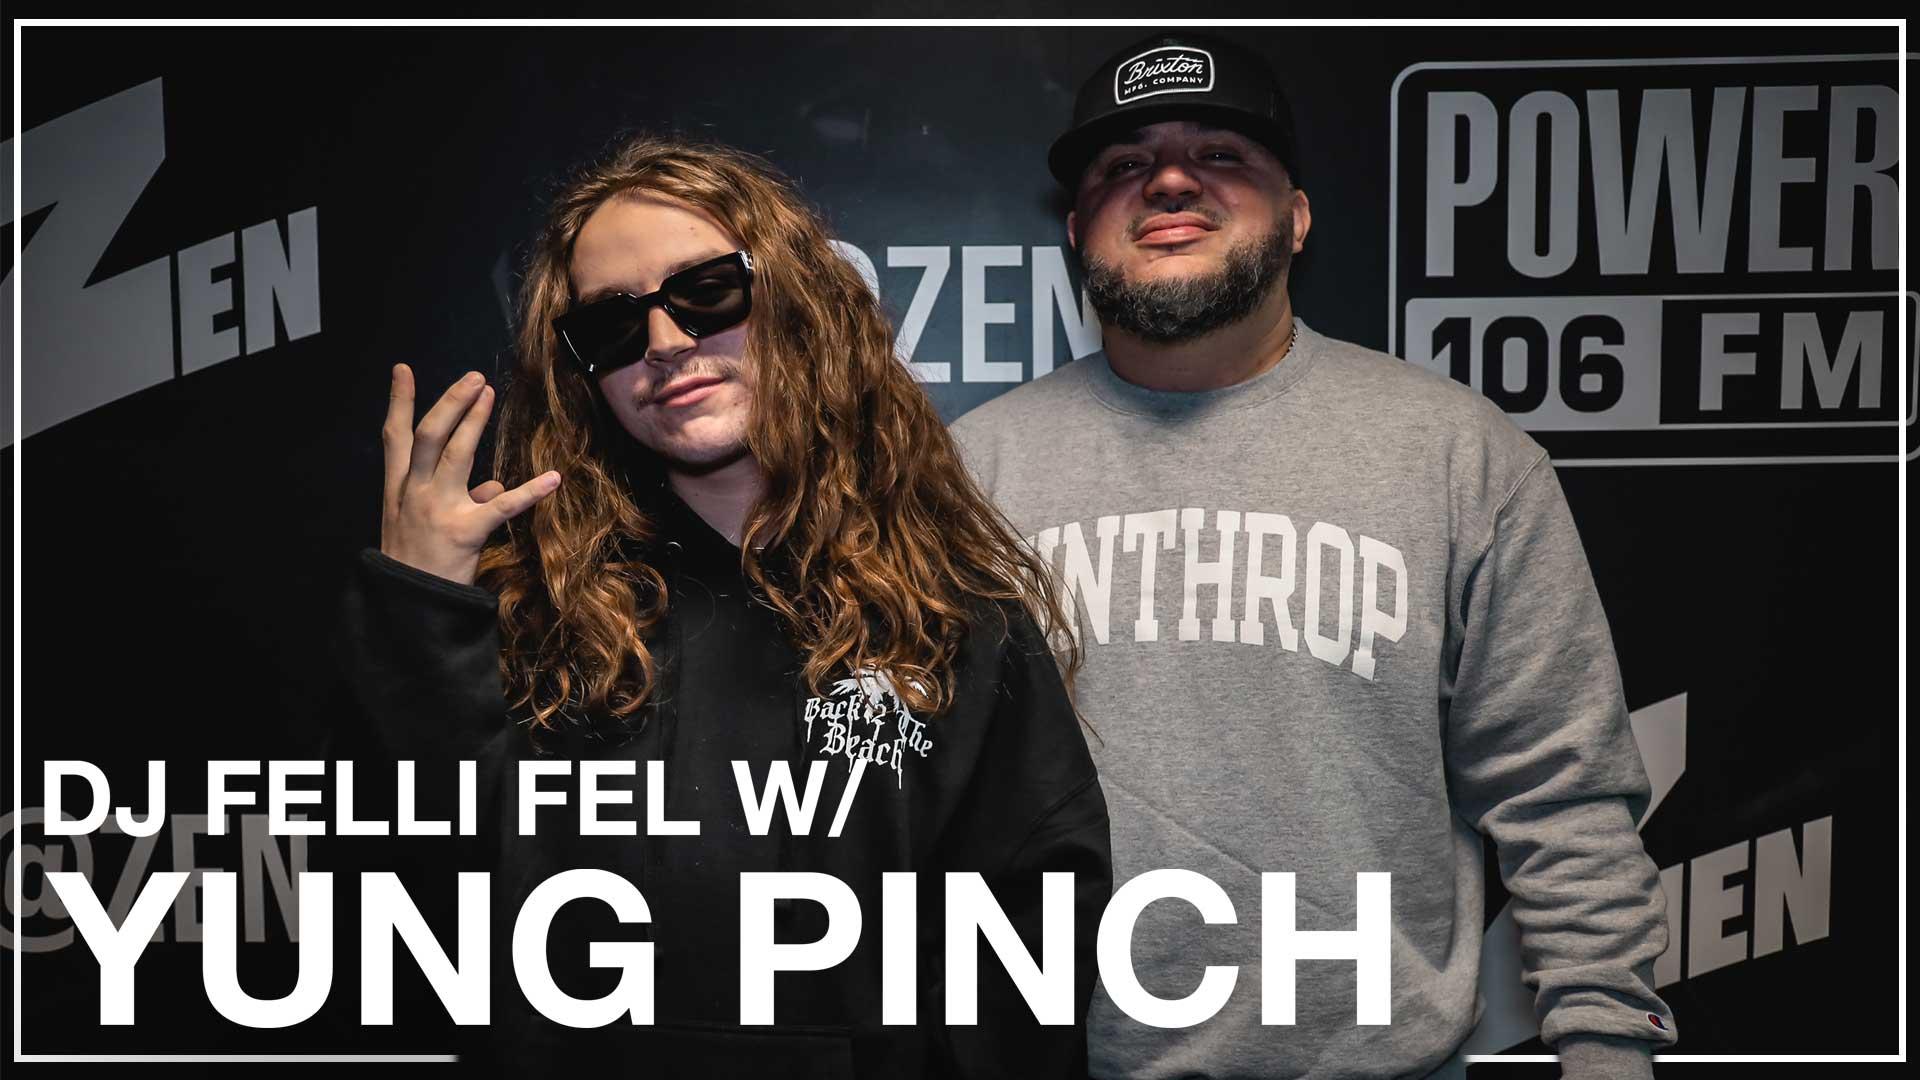 Yung Pinch Says Working w/ Wiz Khalifa Was A Dream Come True [WATCH]